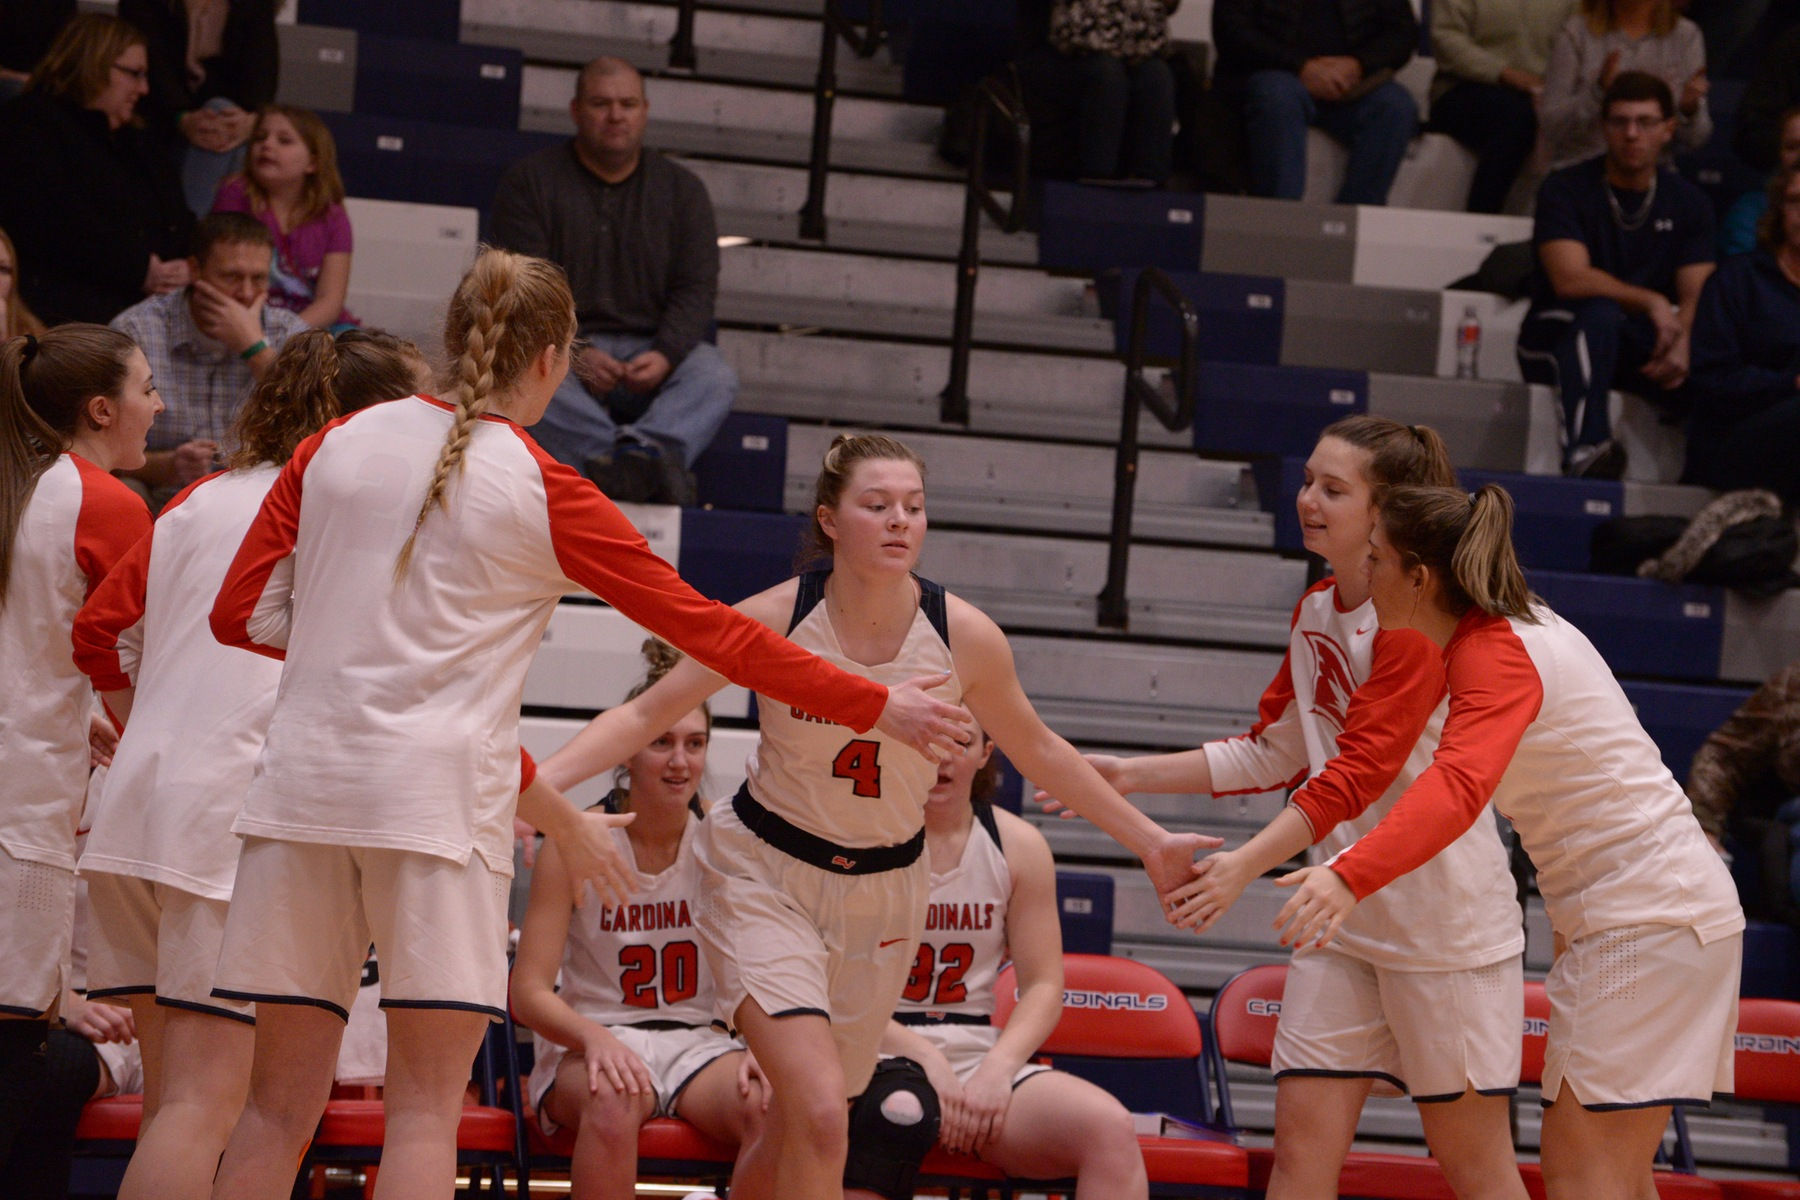 Women's Basketball vs Northern Michigan - Dec. 1. 2018 - Saginaw Valley State